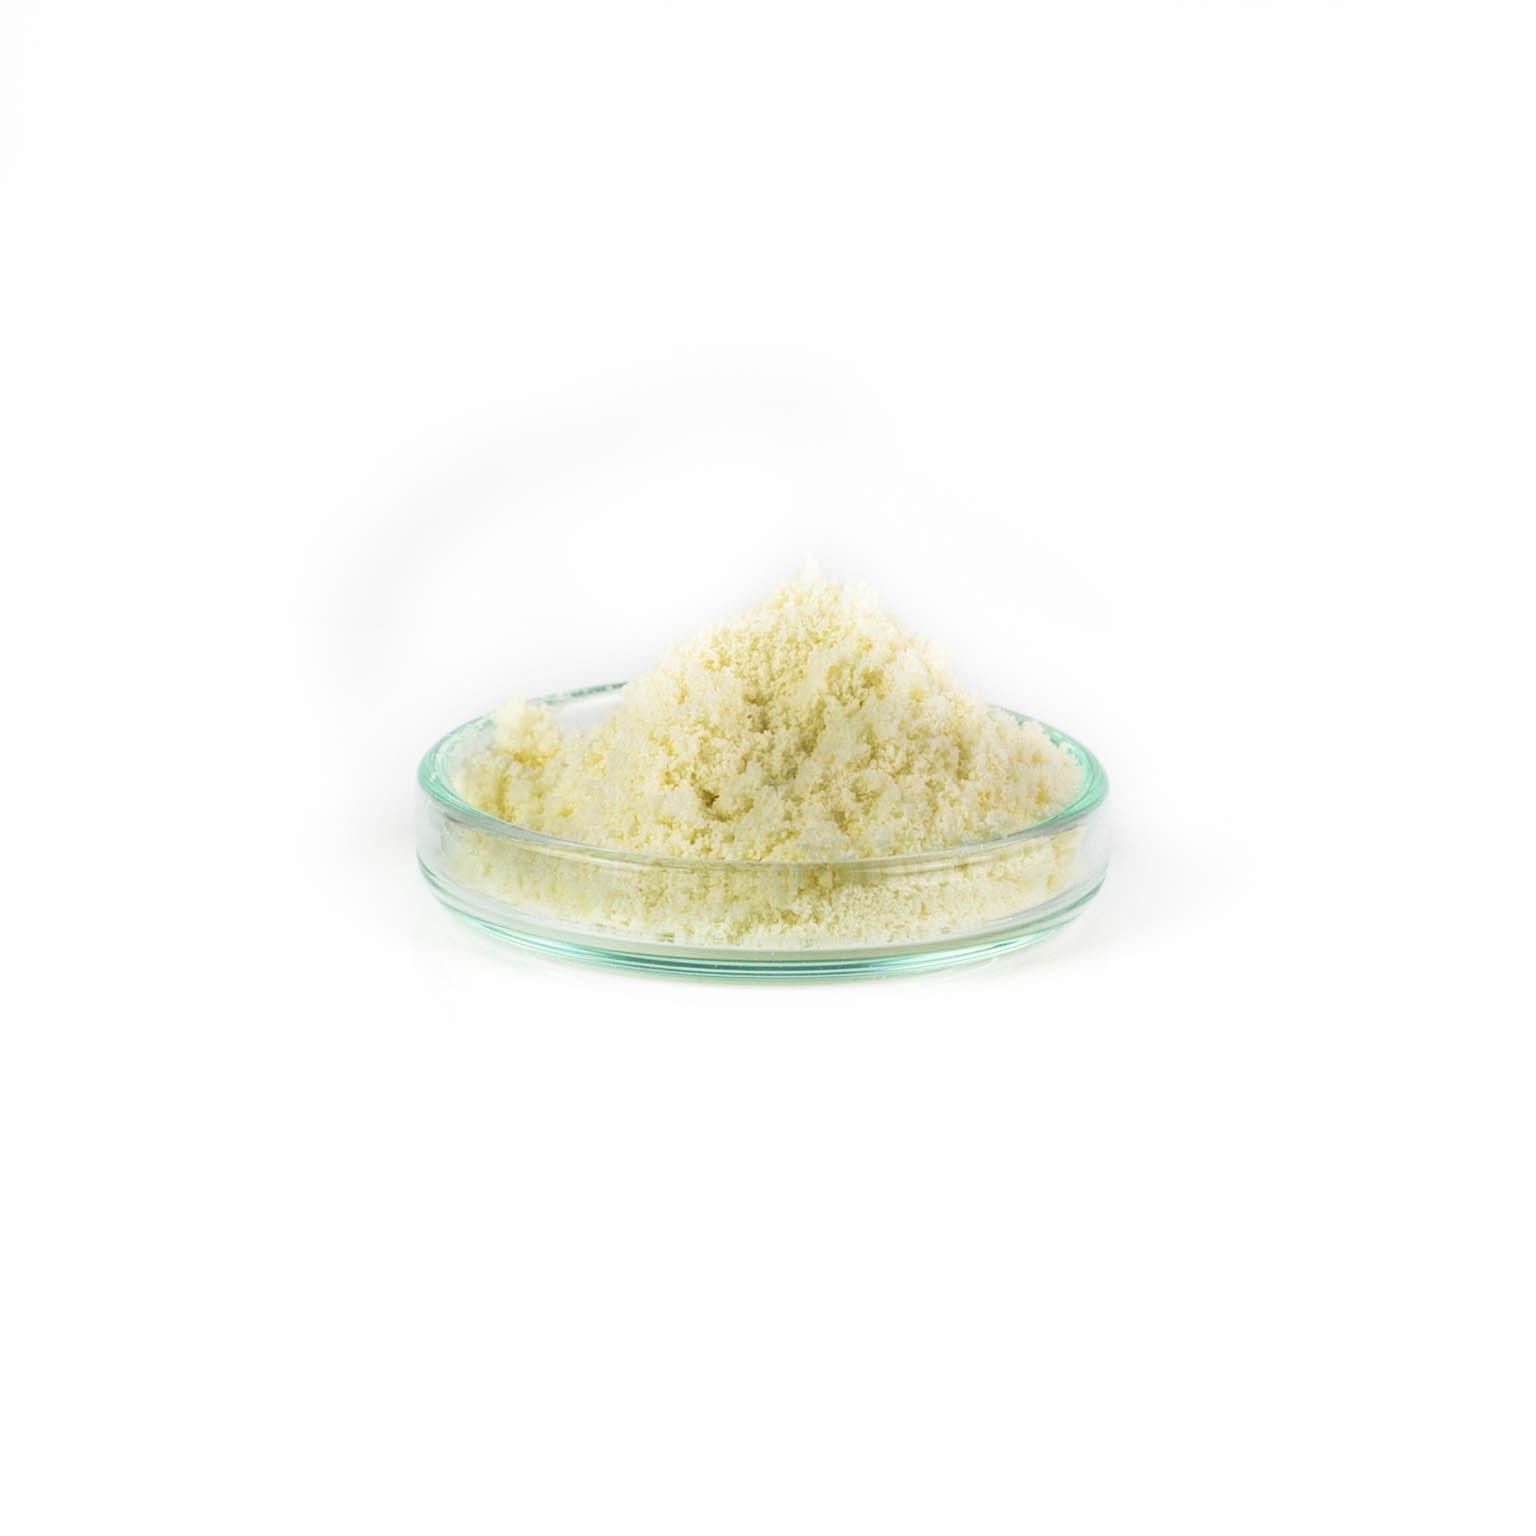 Mléčné proteiny 250g - Lactalbumin